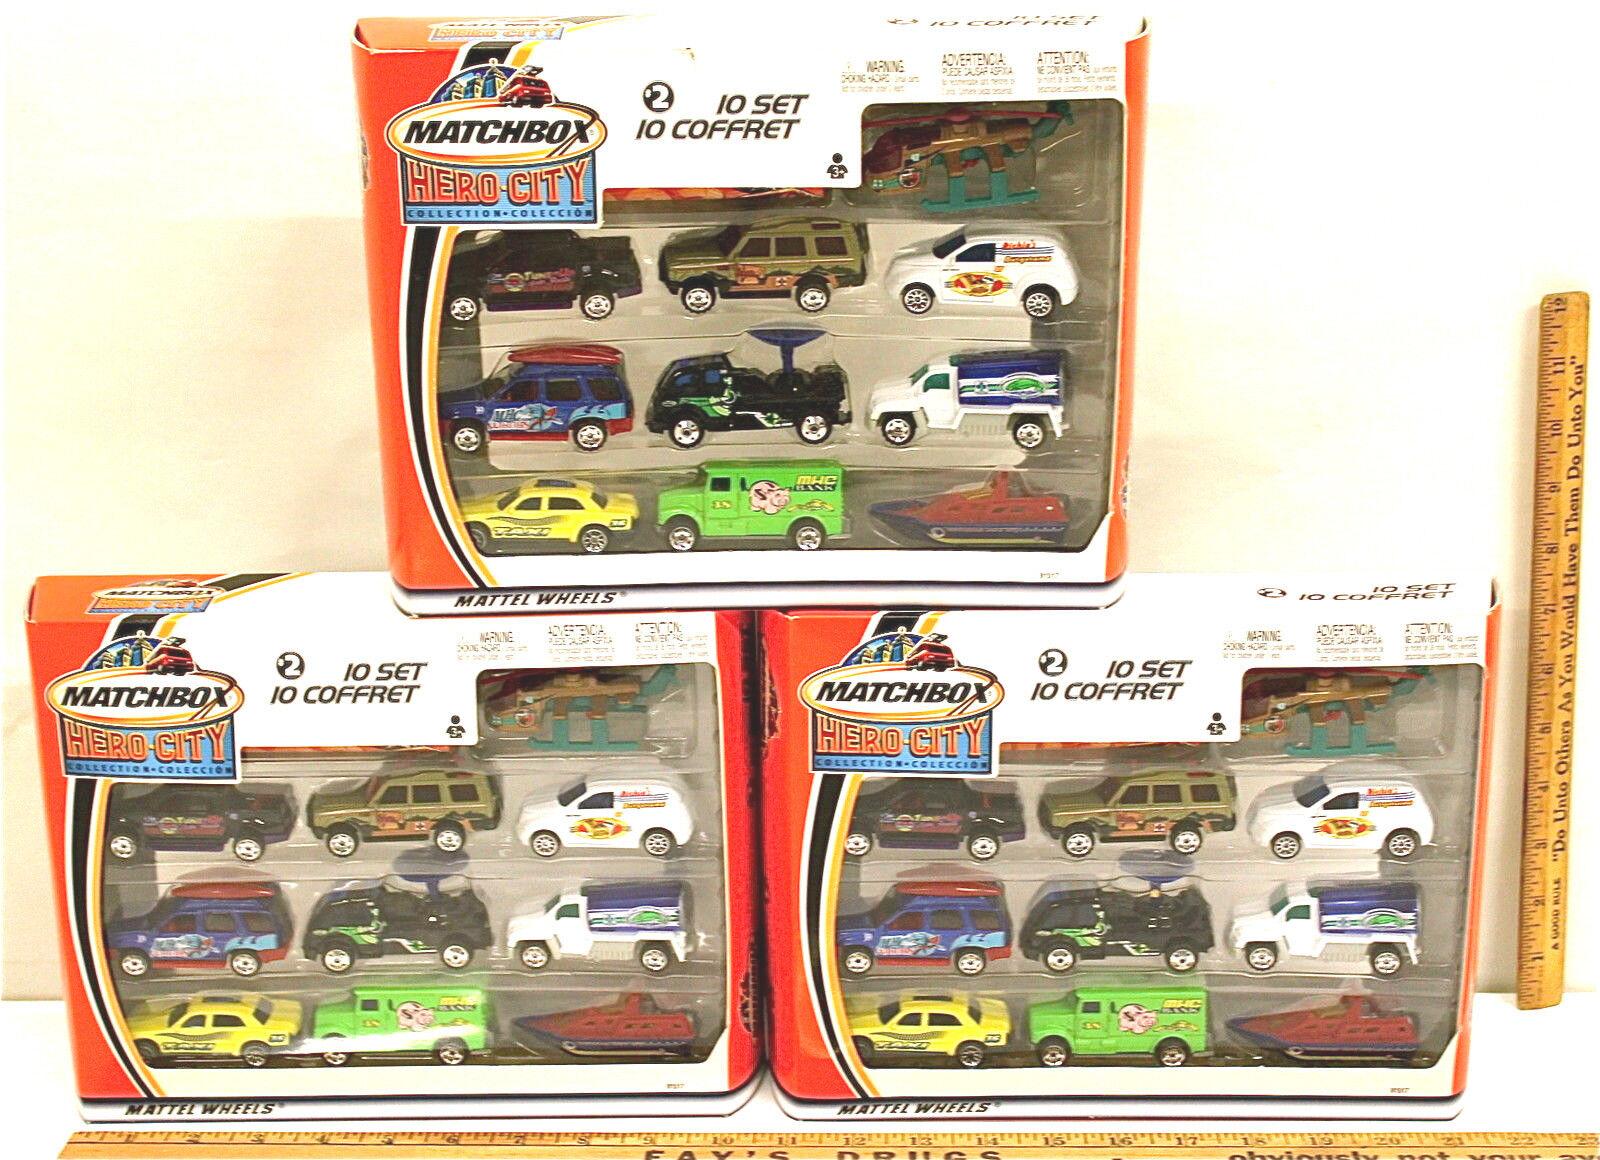 3 Sets 2002 Matchbox Hero City Collection Car Set Mattel 30 Piece Lot NIB